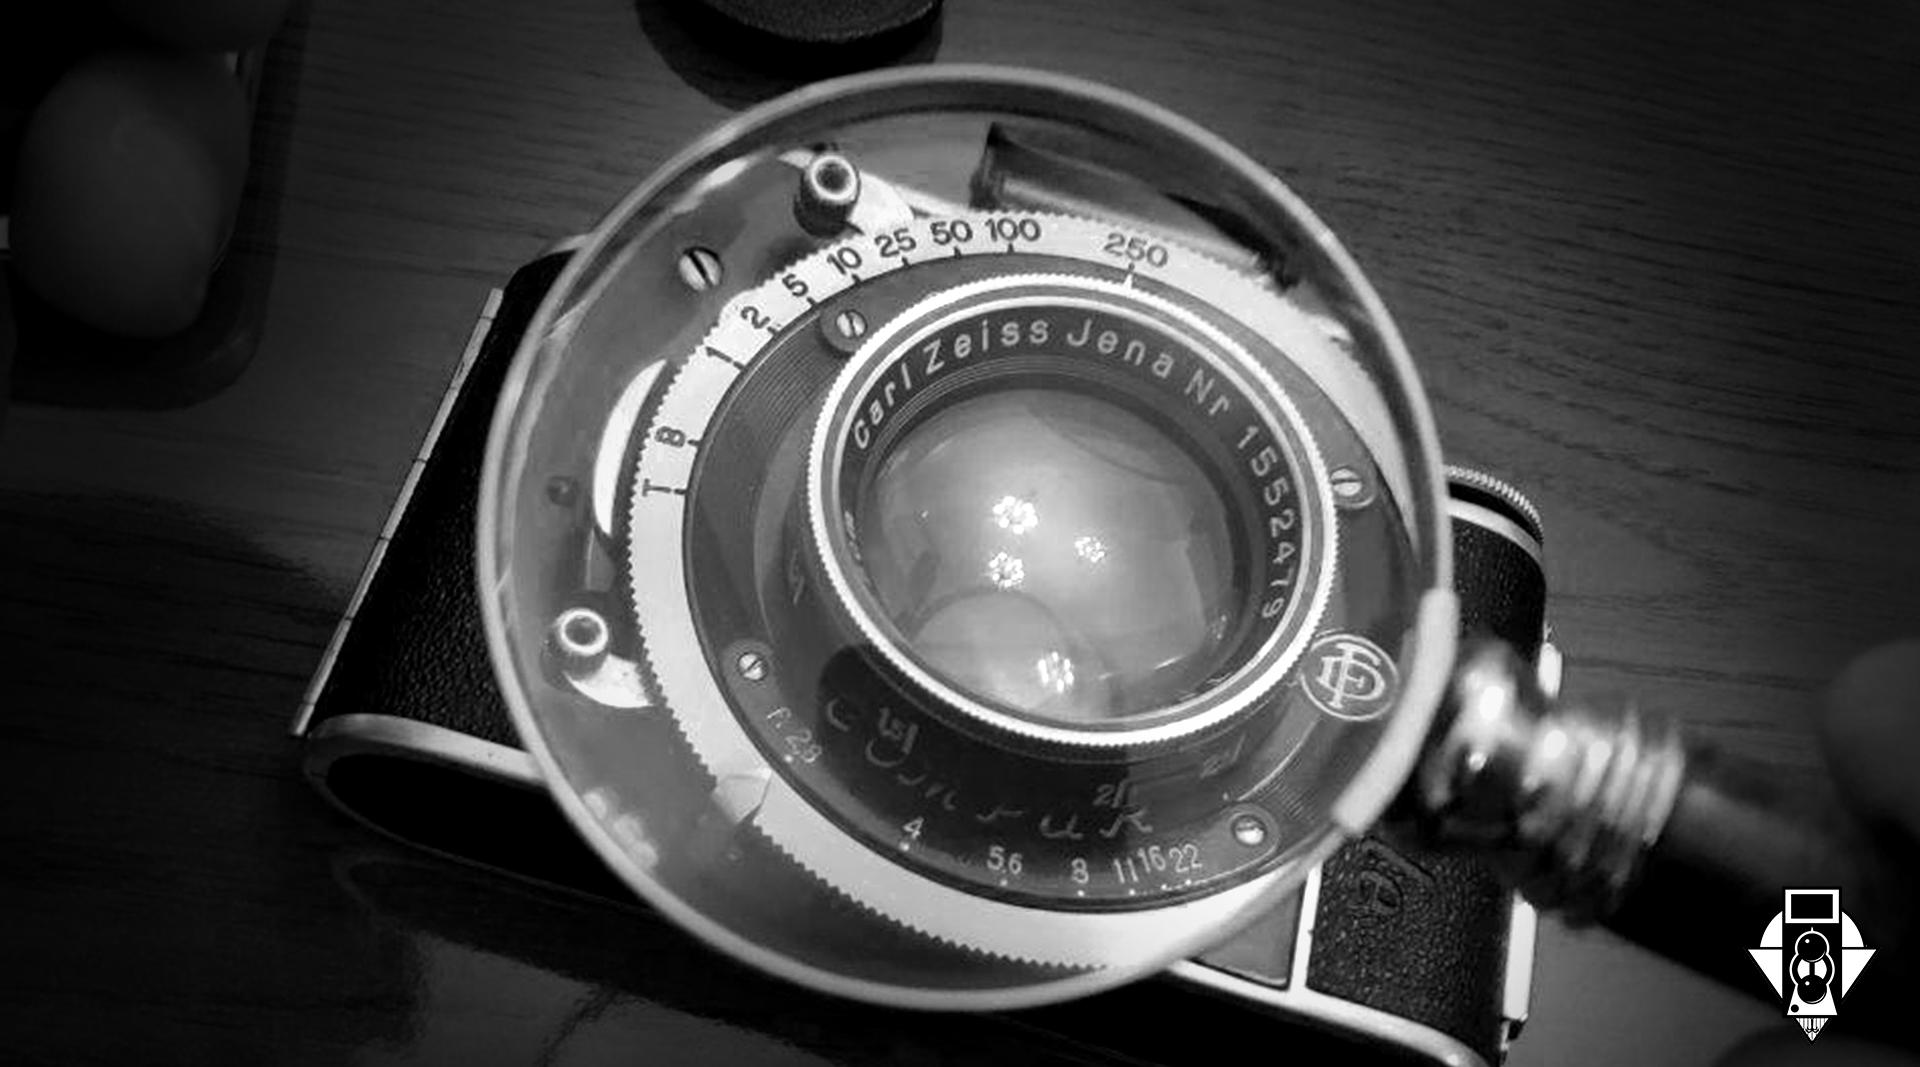 Беседа о фотоаппаратах и фотографии